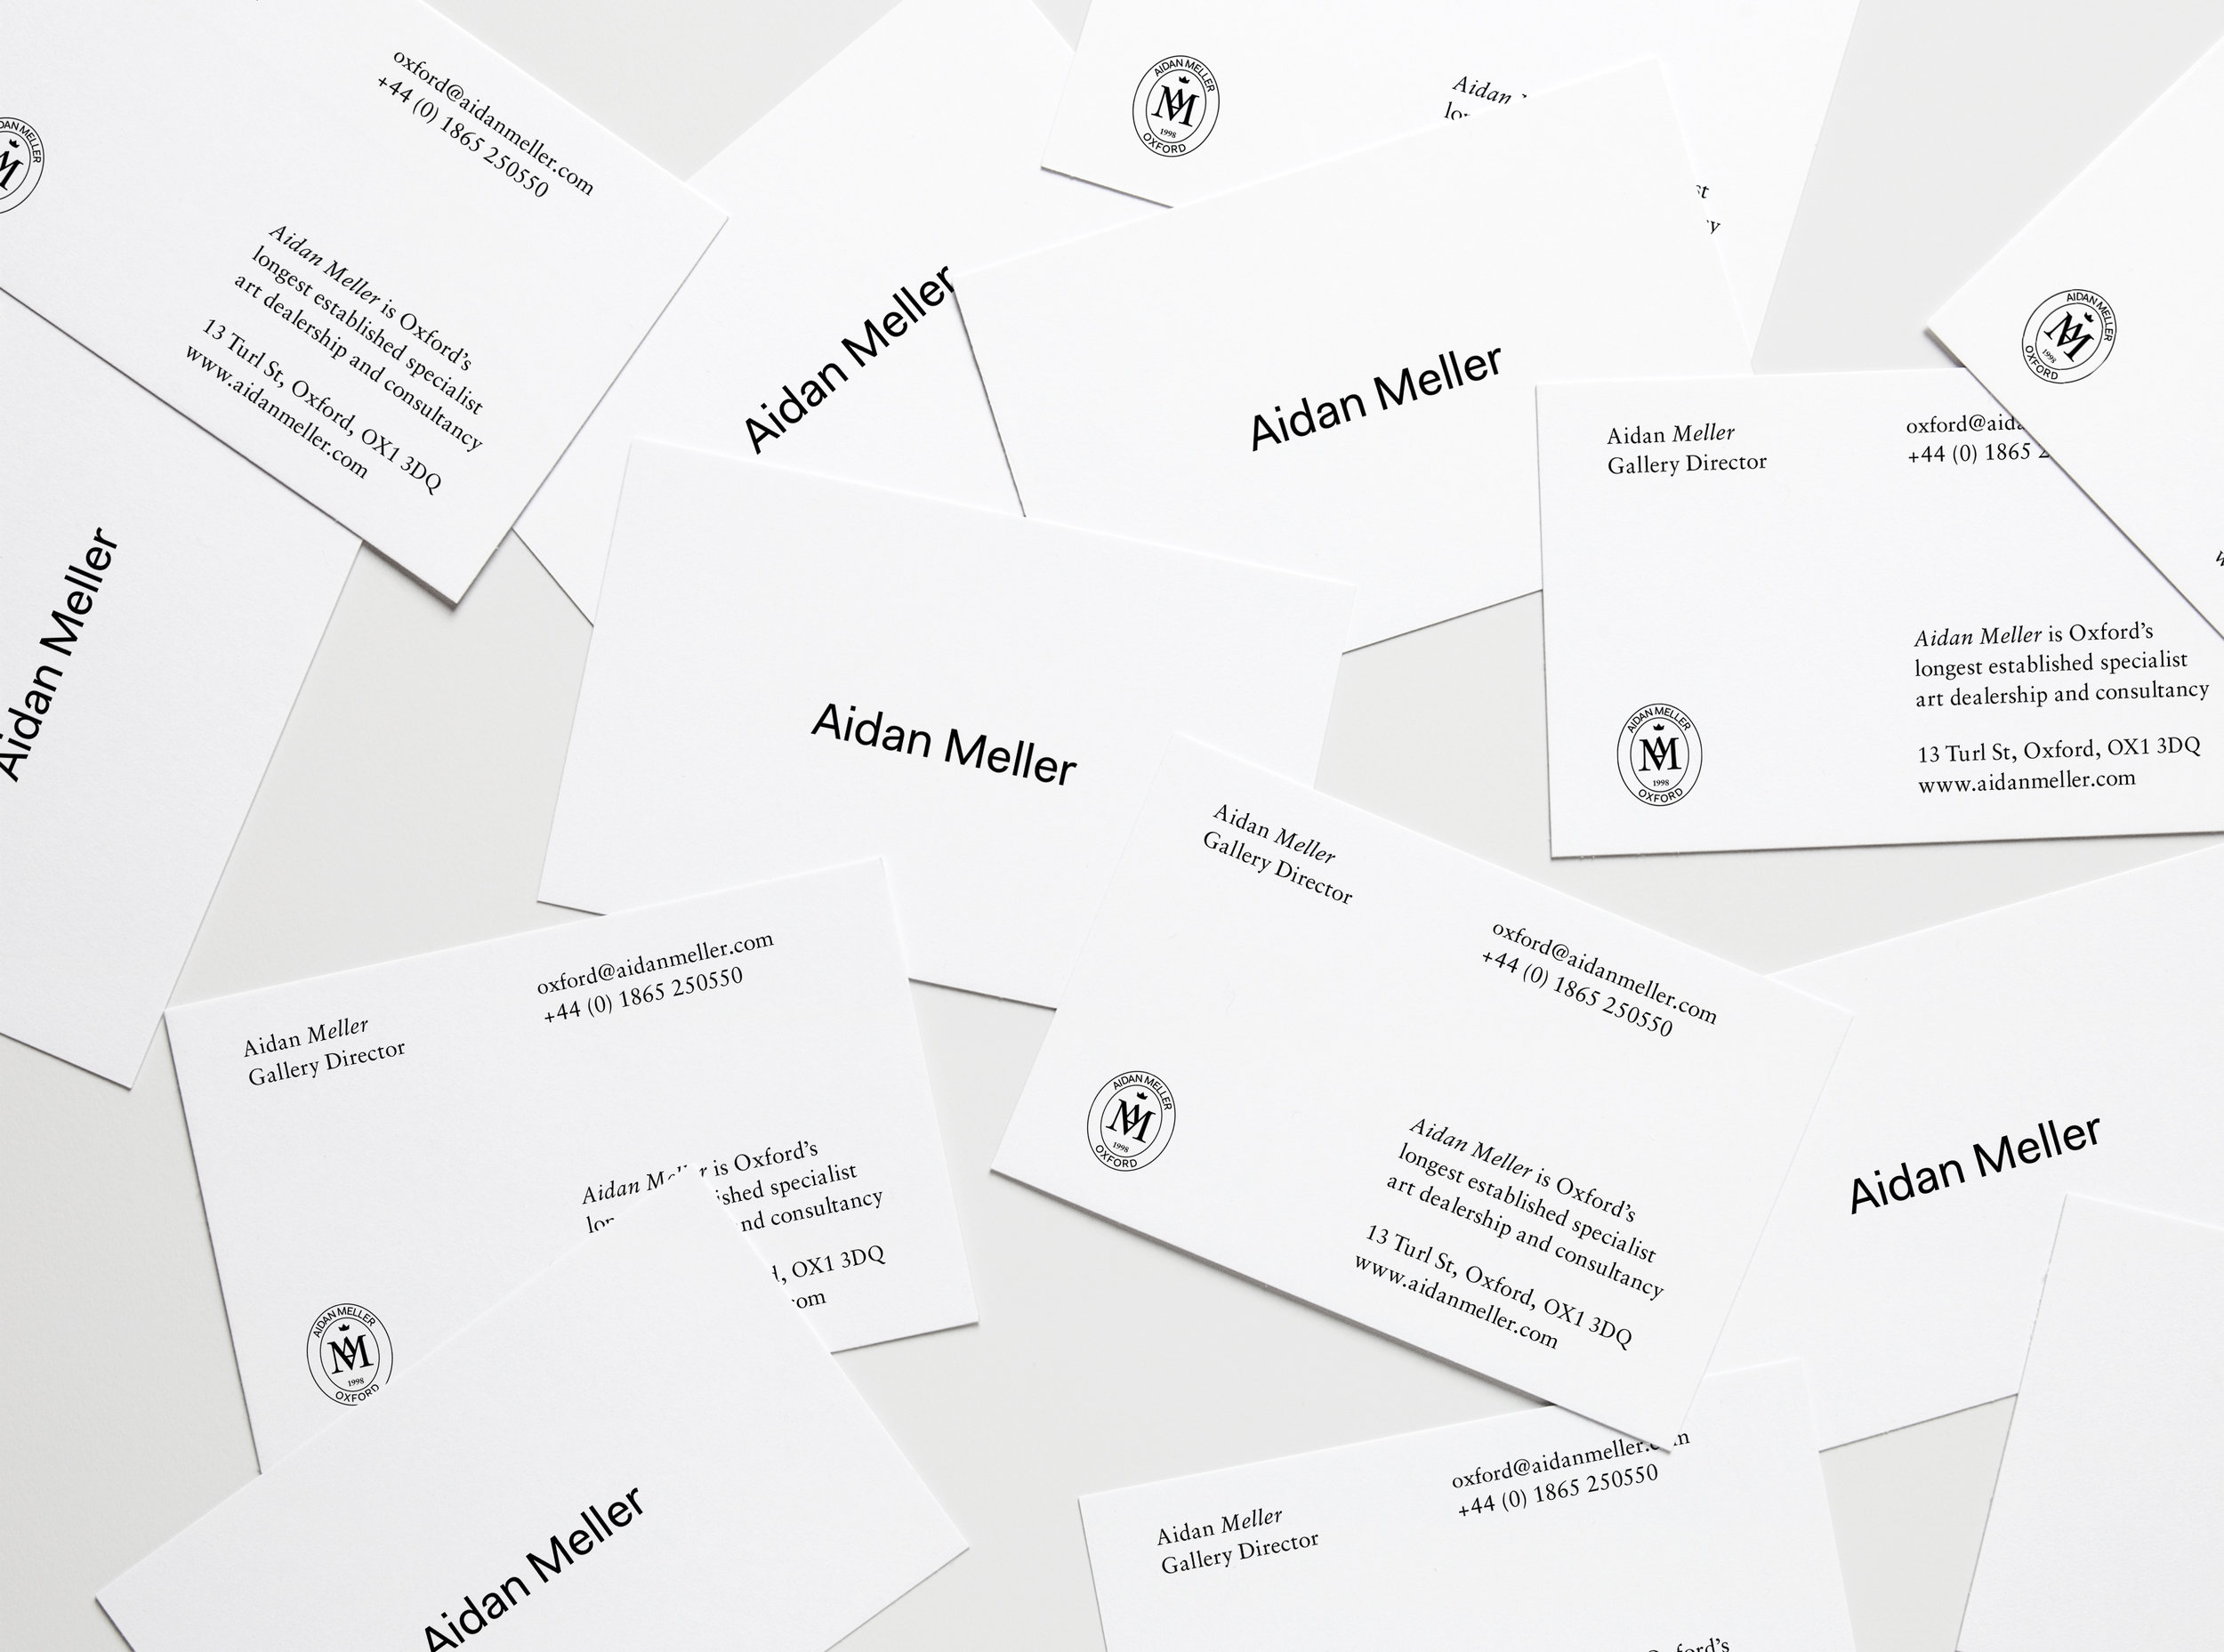 Aidan Meller Business card pile.jpg